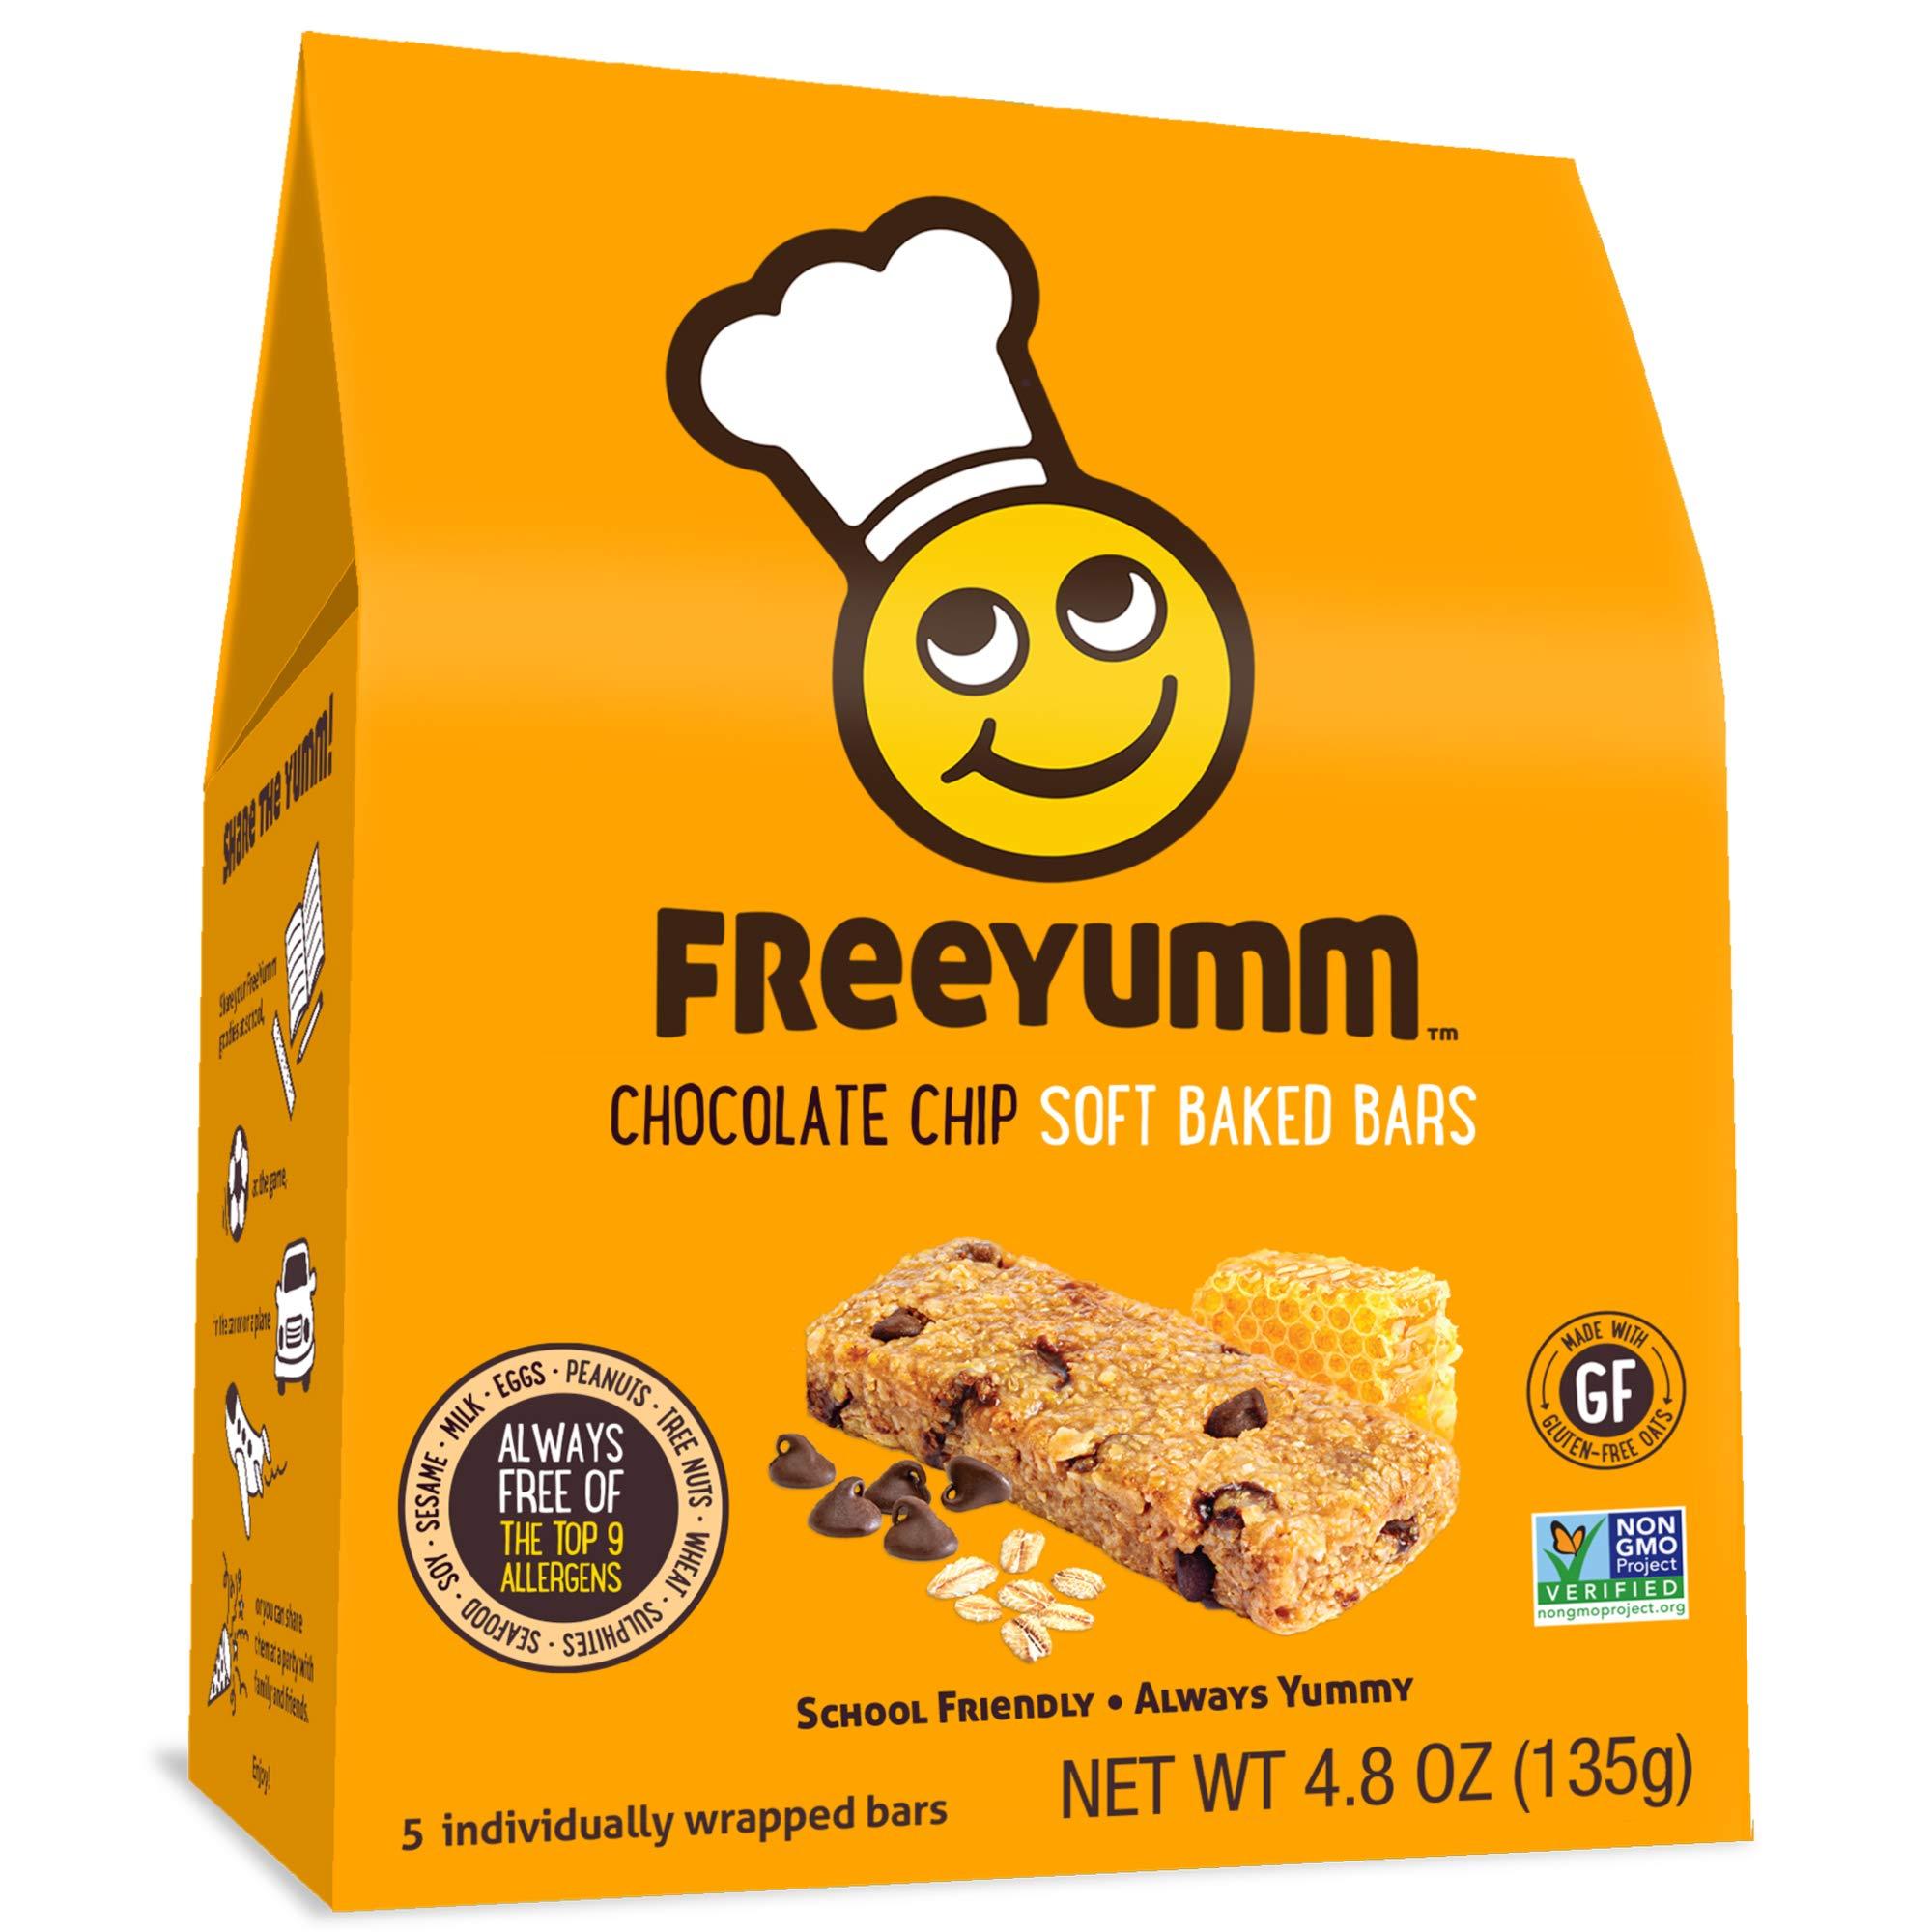 FreeYumm Allergen Free Granola Bars, Gluten Free, Dairy Free, Nut Free Snacks for Kids, Total of 15 Bars (Chocolate Chip) by FreeYumm